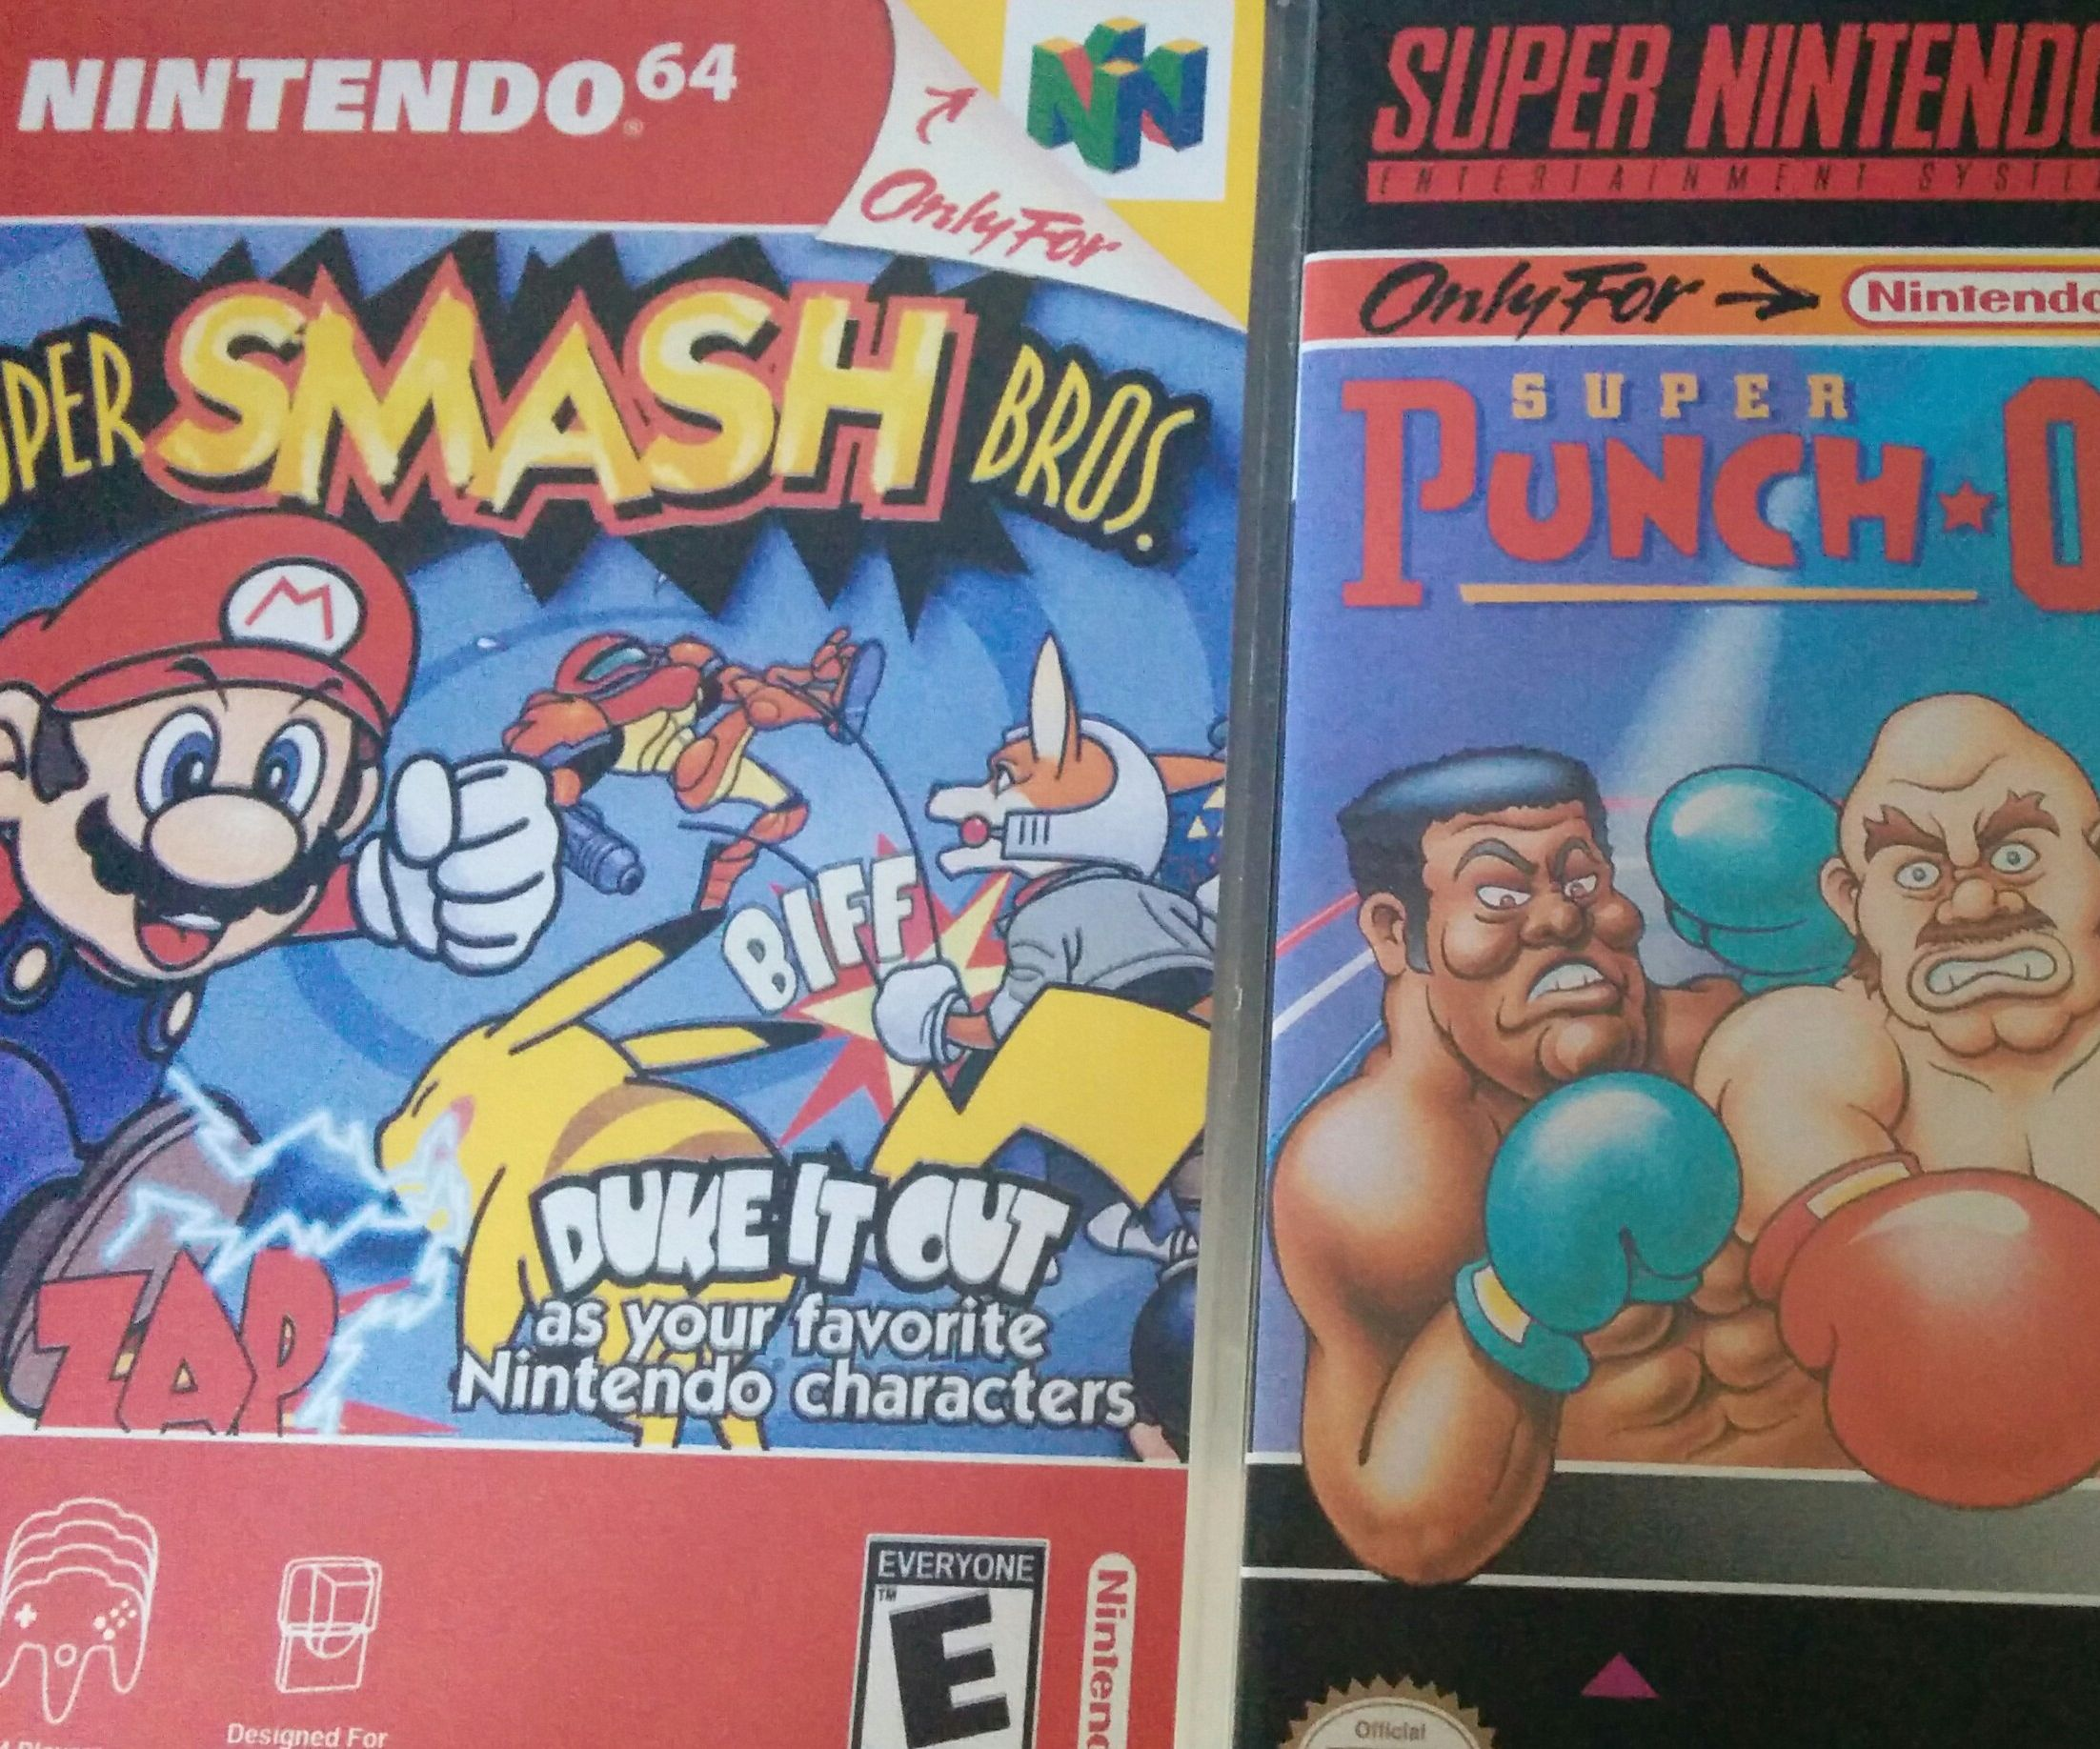 Make Game Cases for N64, SNES, NES, Genesis Cartridges: 5 Steps